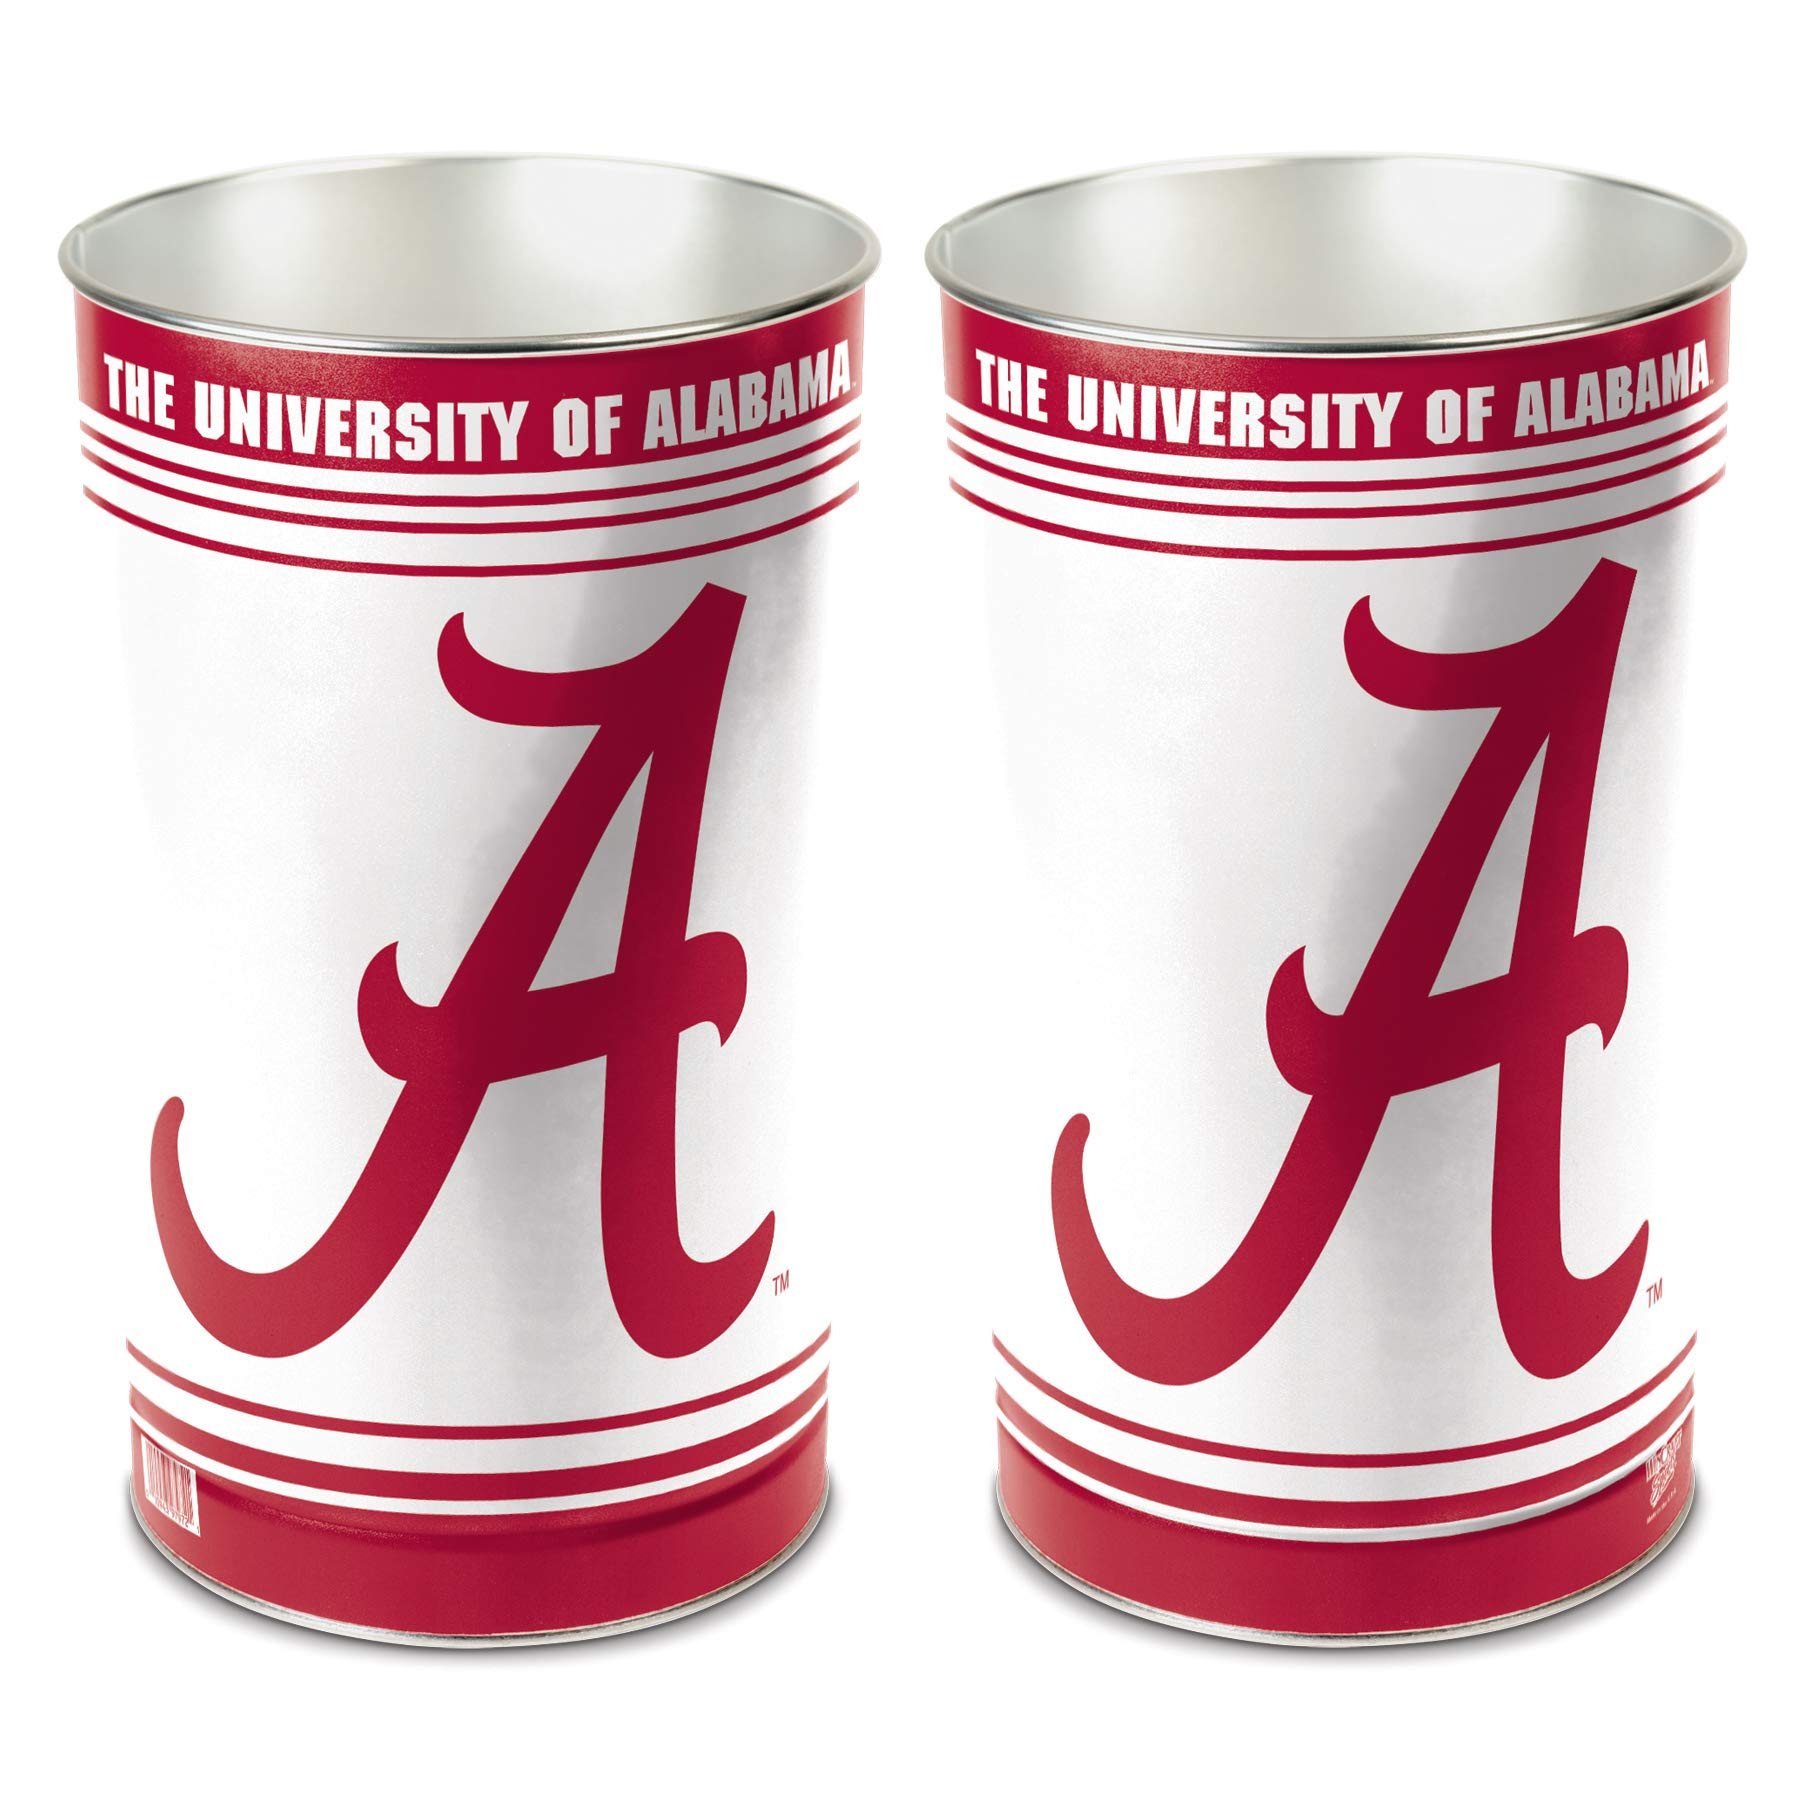 WinCraft NCAA 9797210 University of Alabama Tapered Wastebasket, 15'' H